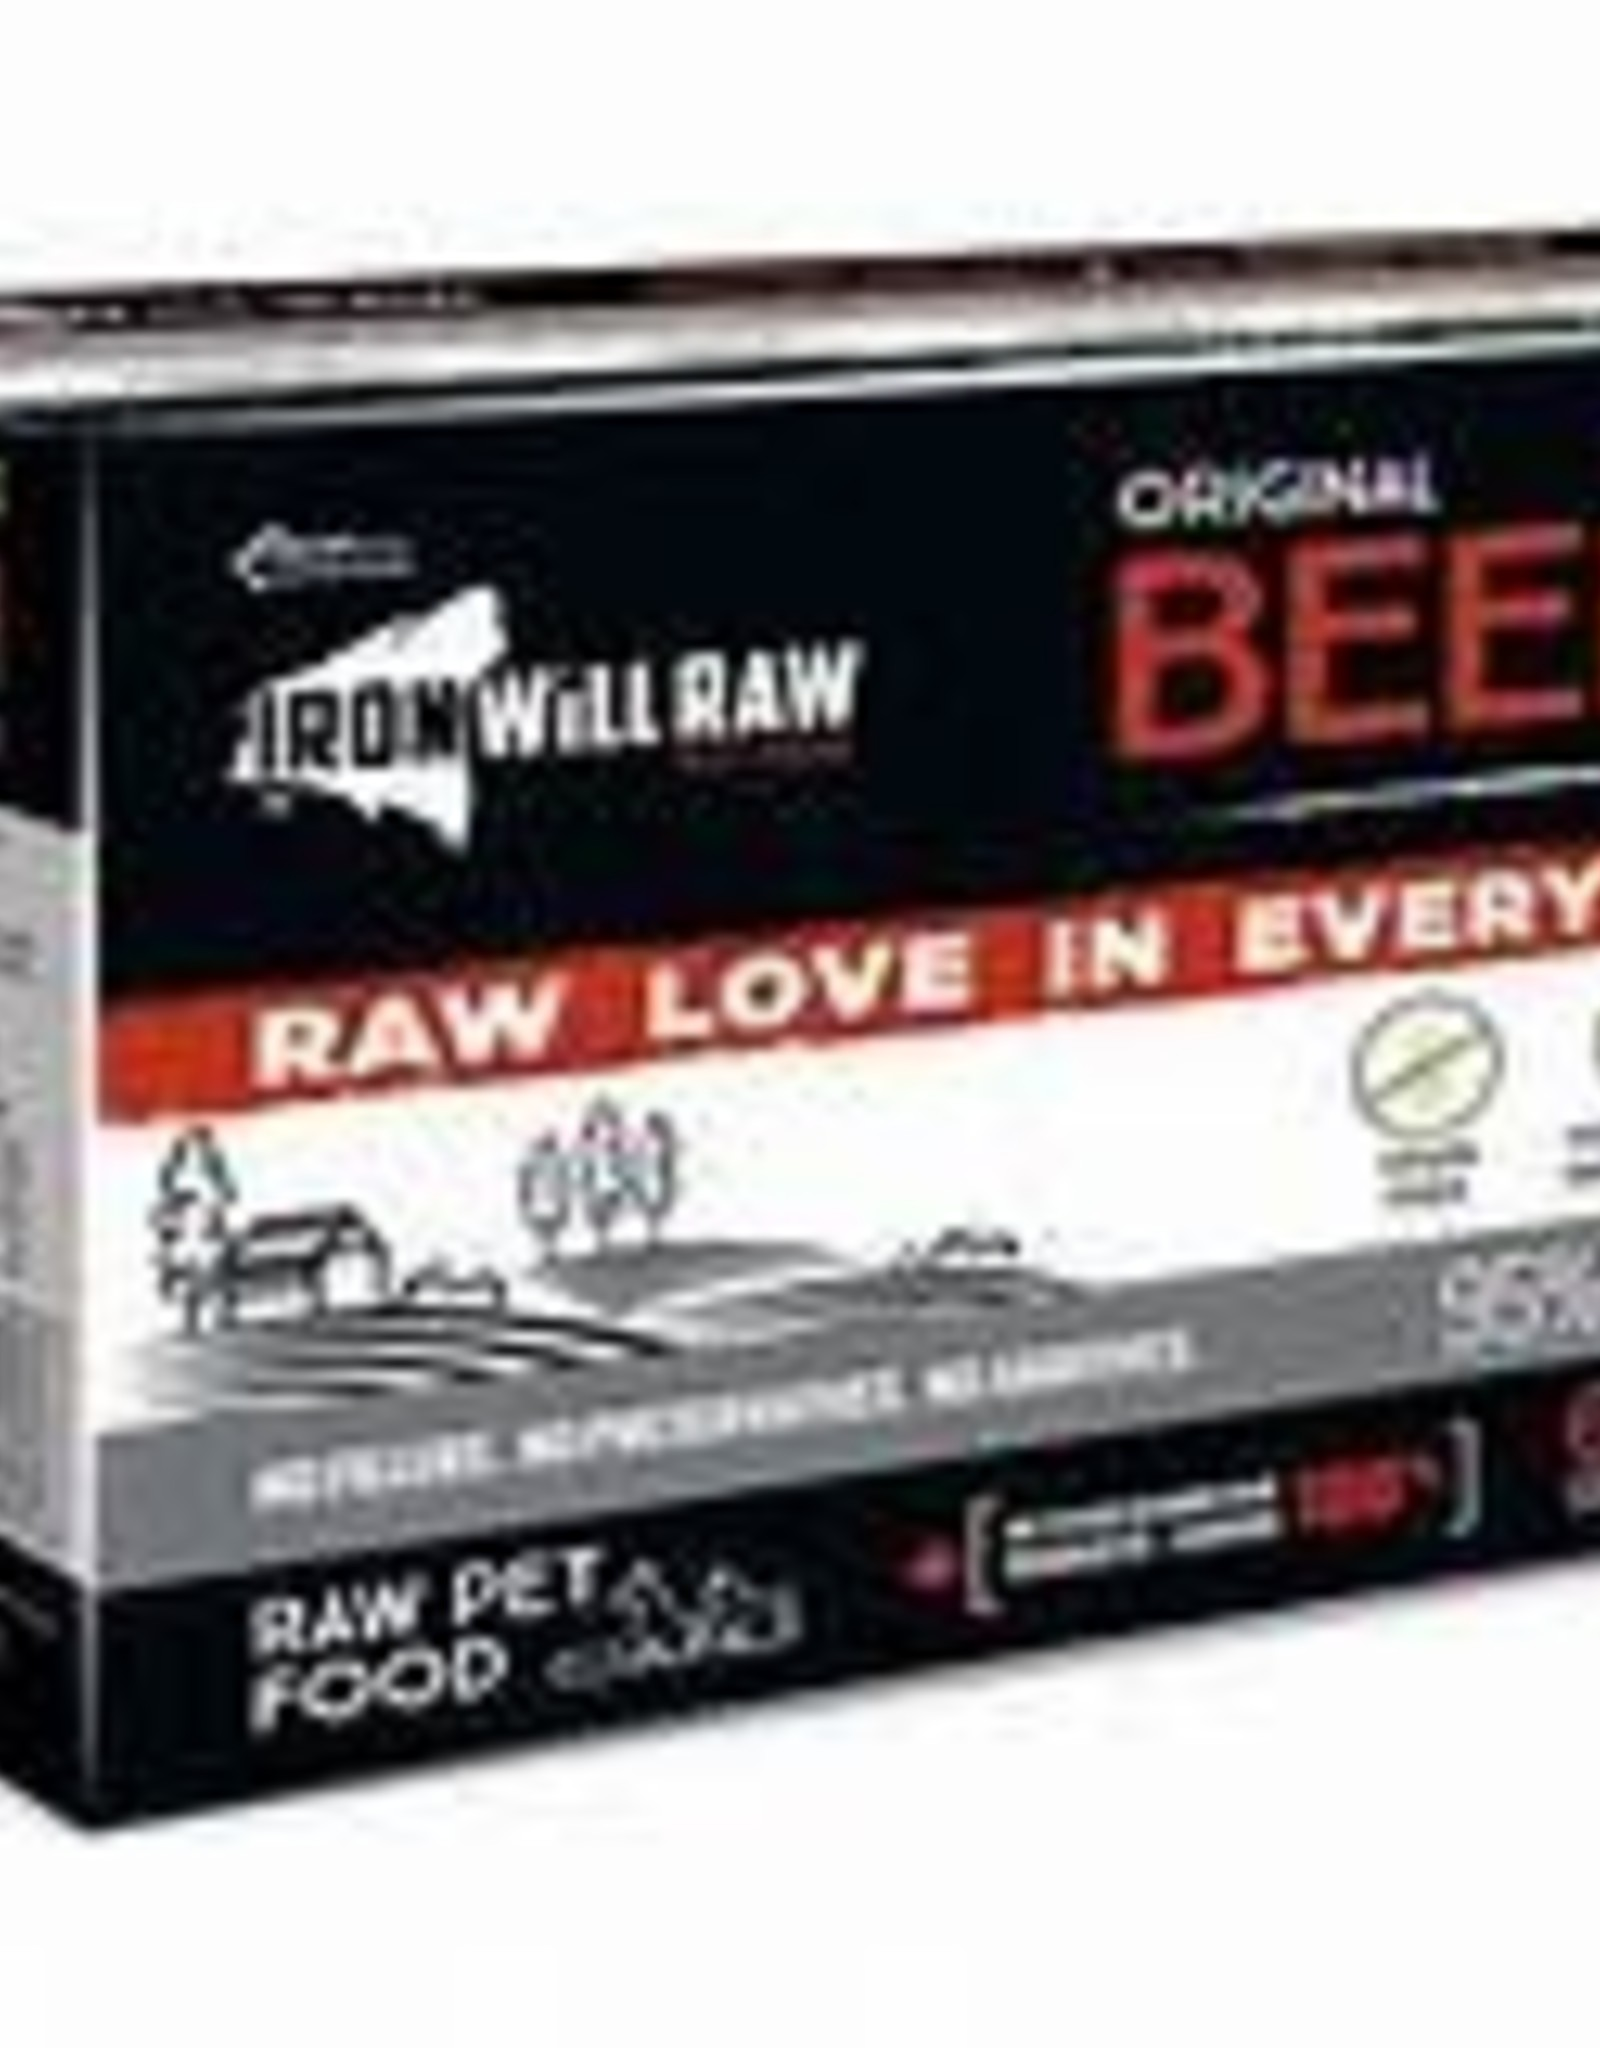 Iron Will Raw Iron Will Original Beef - 6lb box